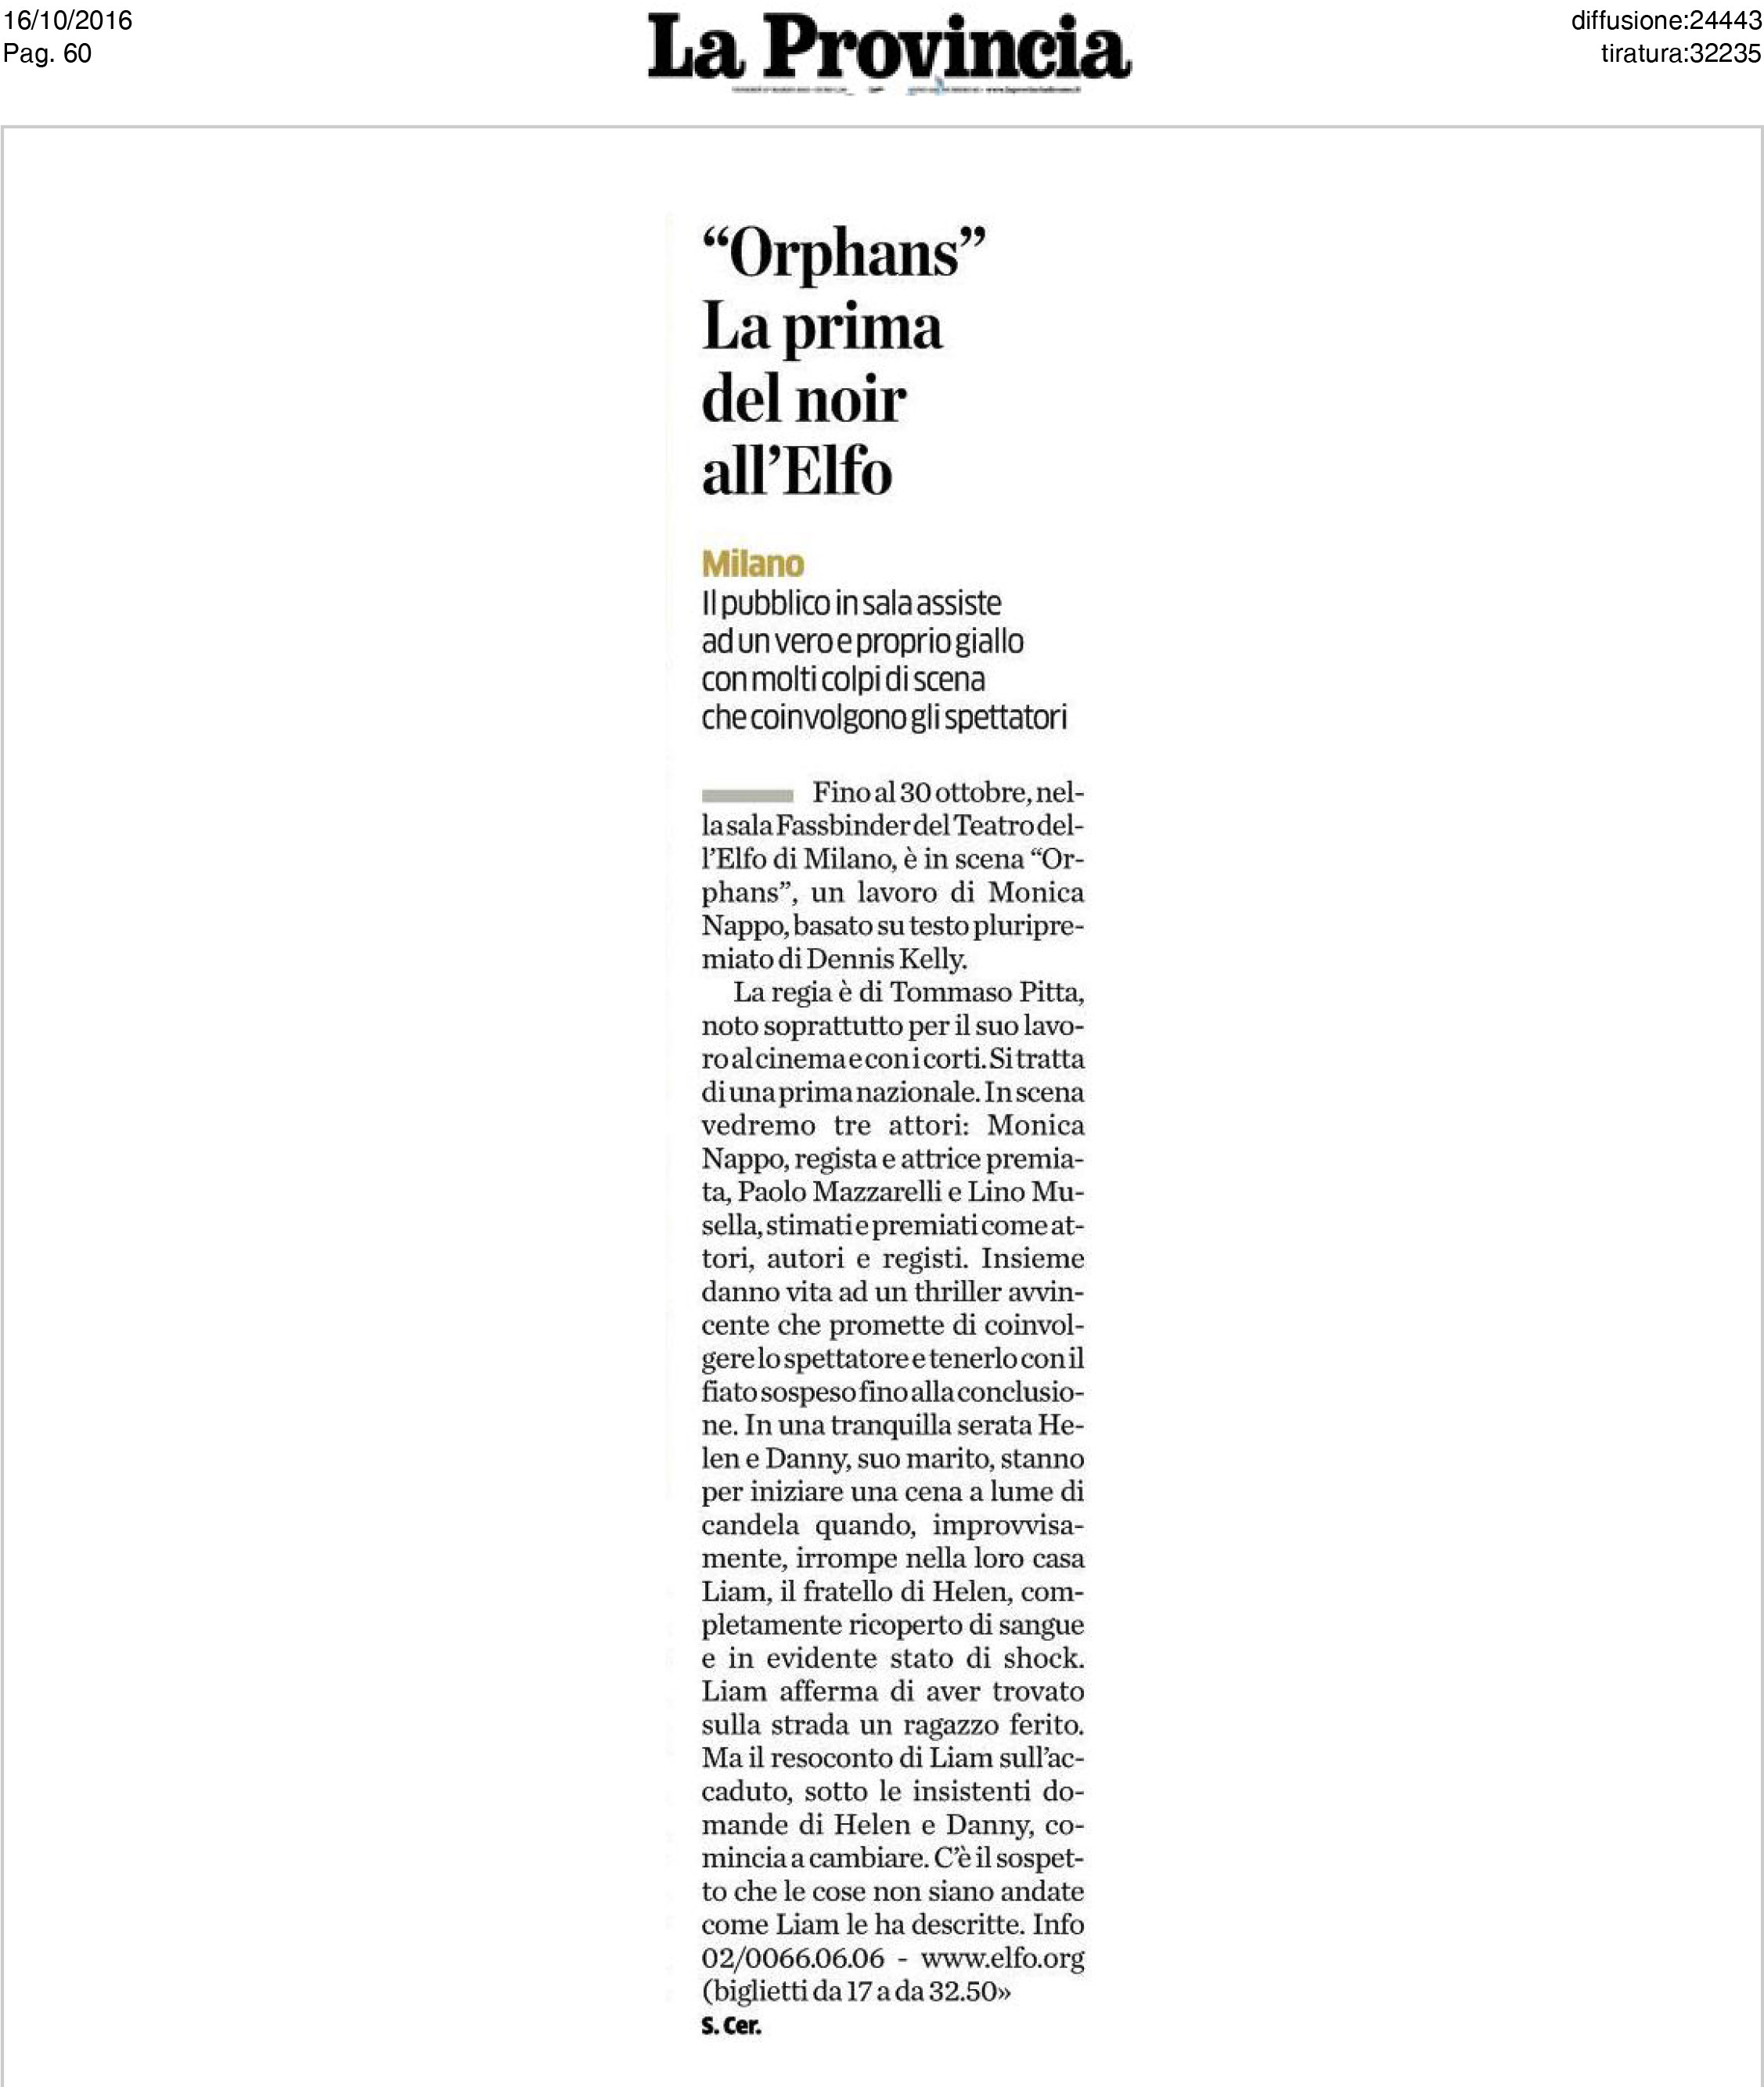 20161016_orphans-la-prima-noir-allelfo_la-provincia